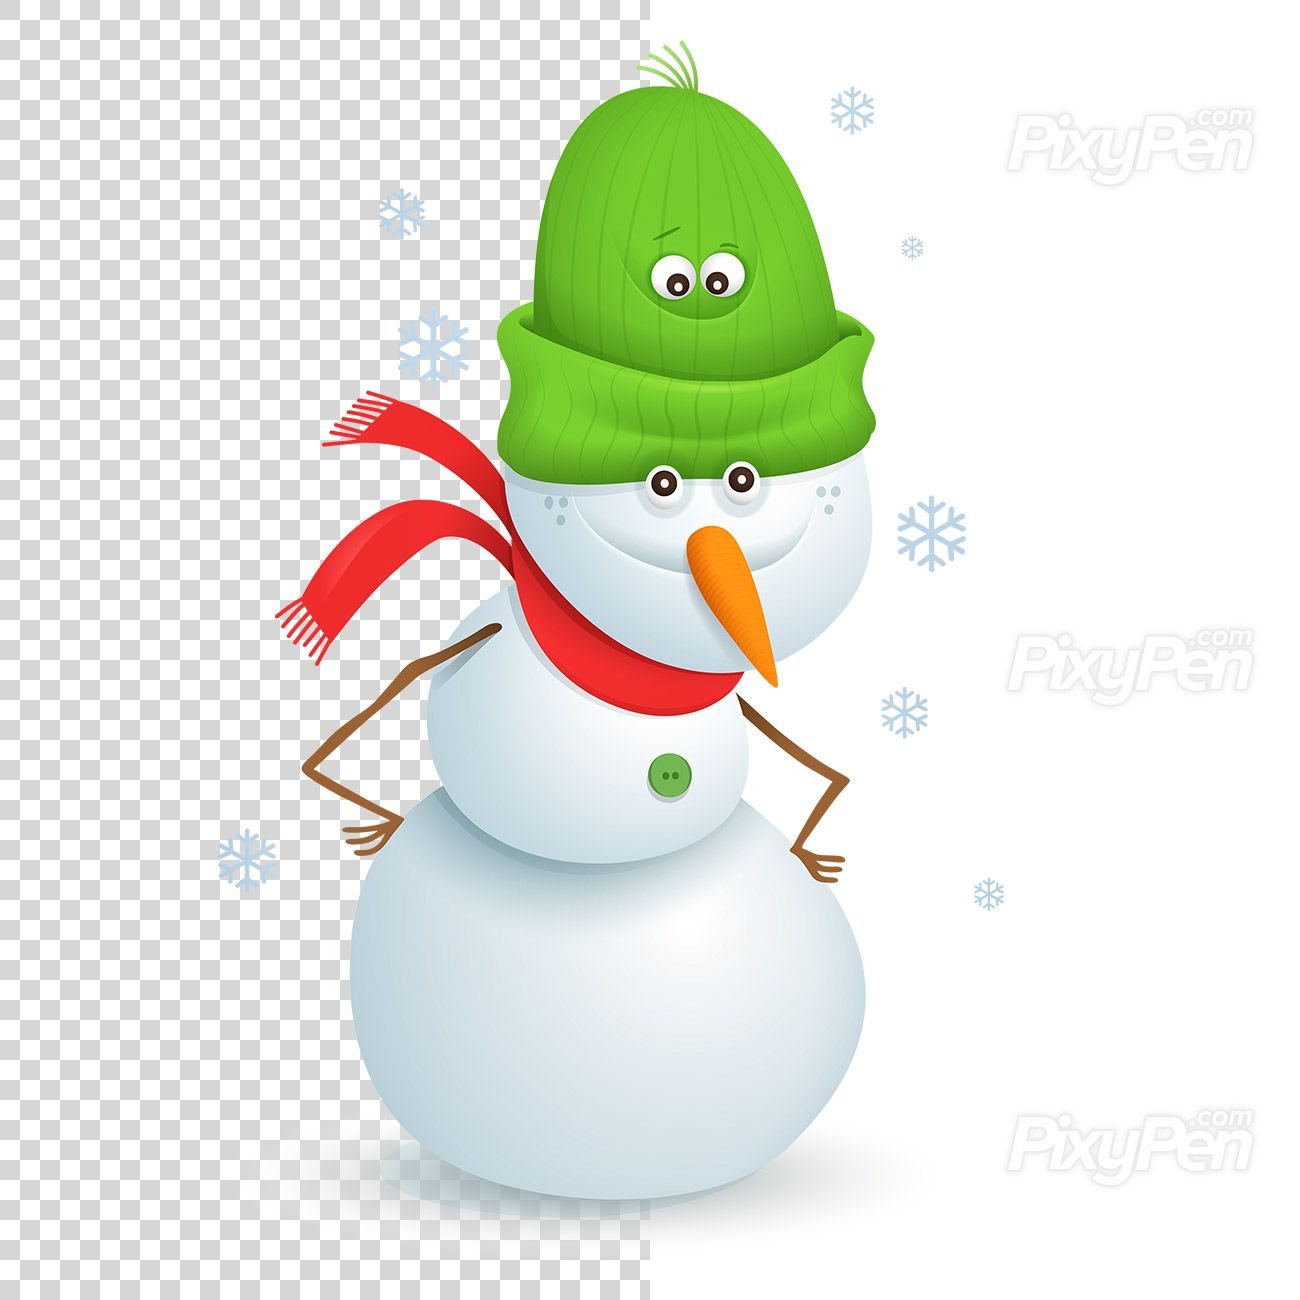 Snowman Clipart On Transparent Background Vector Illustration Pixypen Snowman Clipart Happy New Year 2020 Vector Illustration